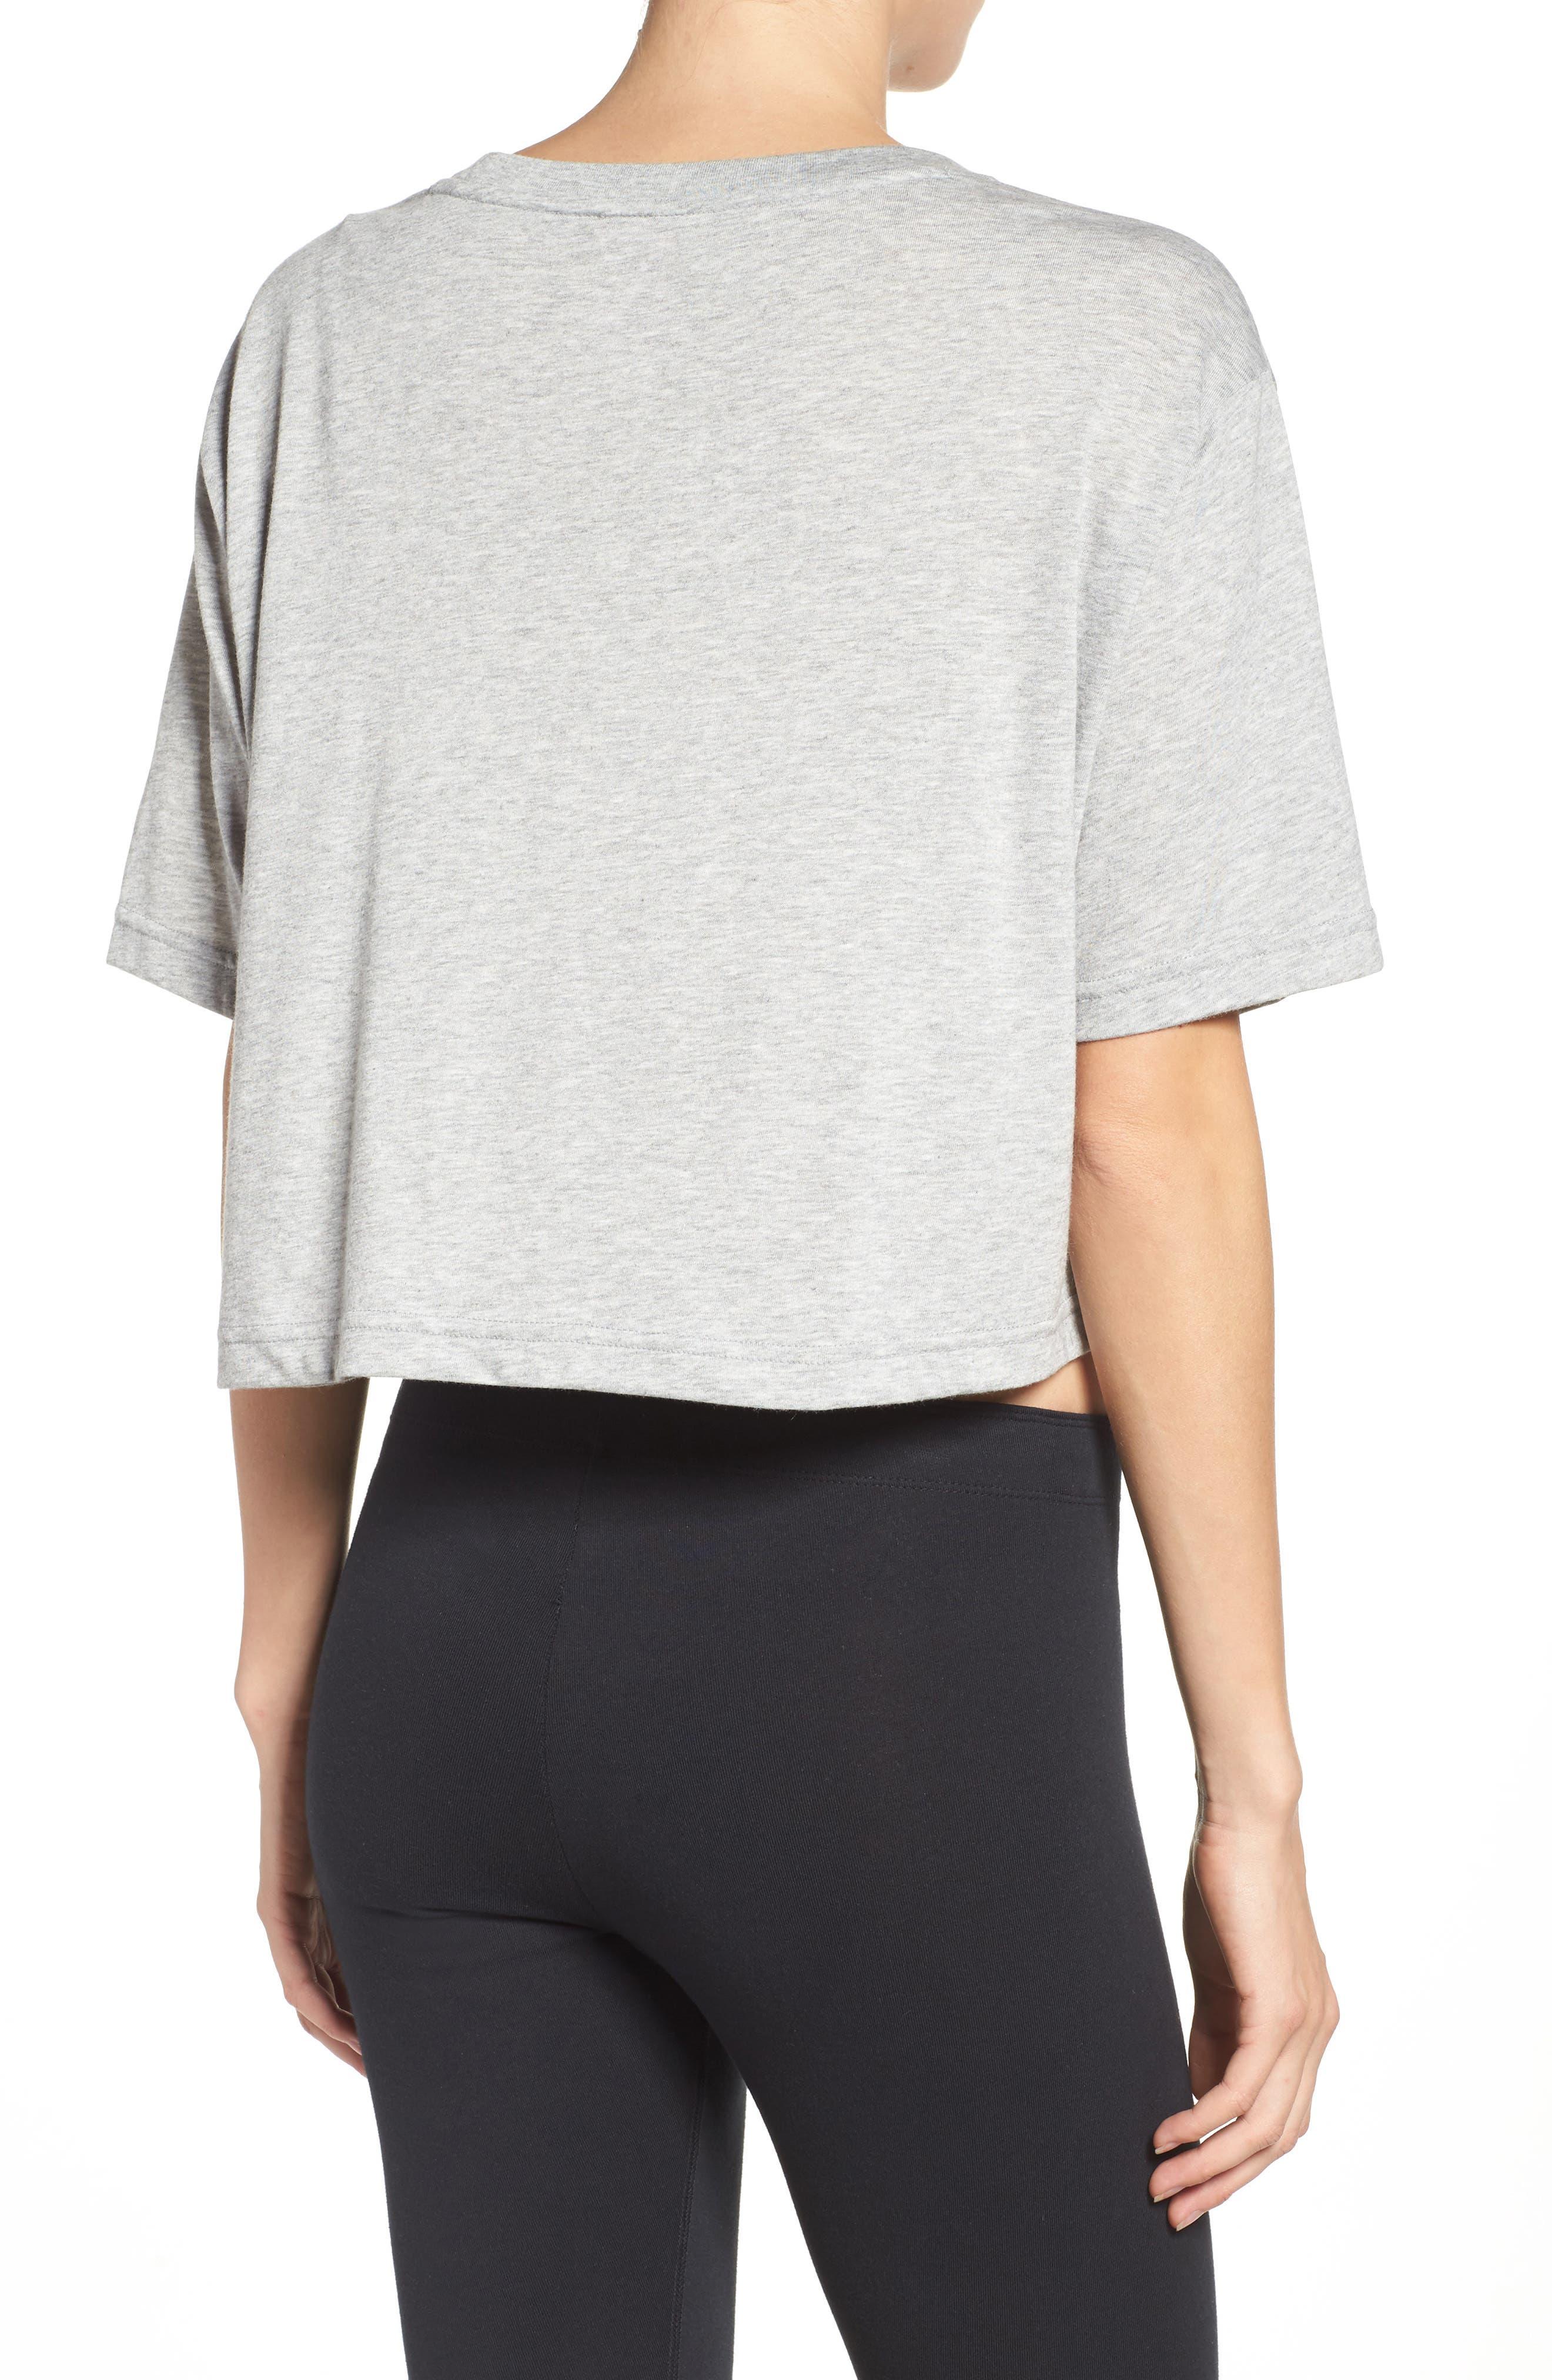 Alternate Image 2  - Nike Sportswear Huarache Graphic Tee